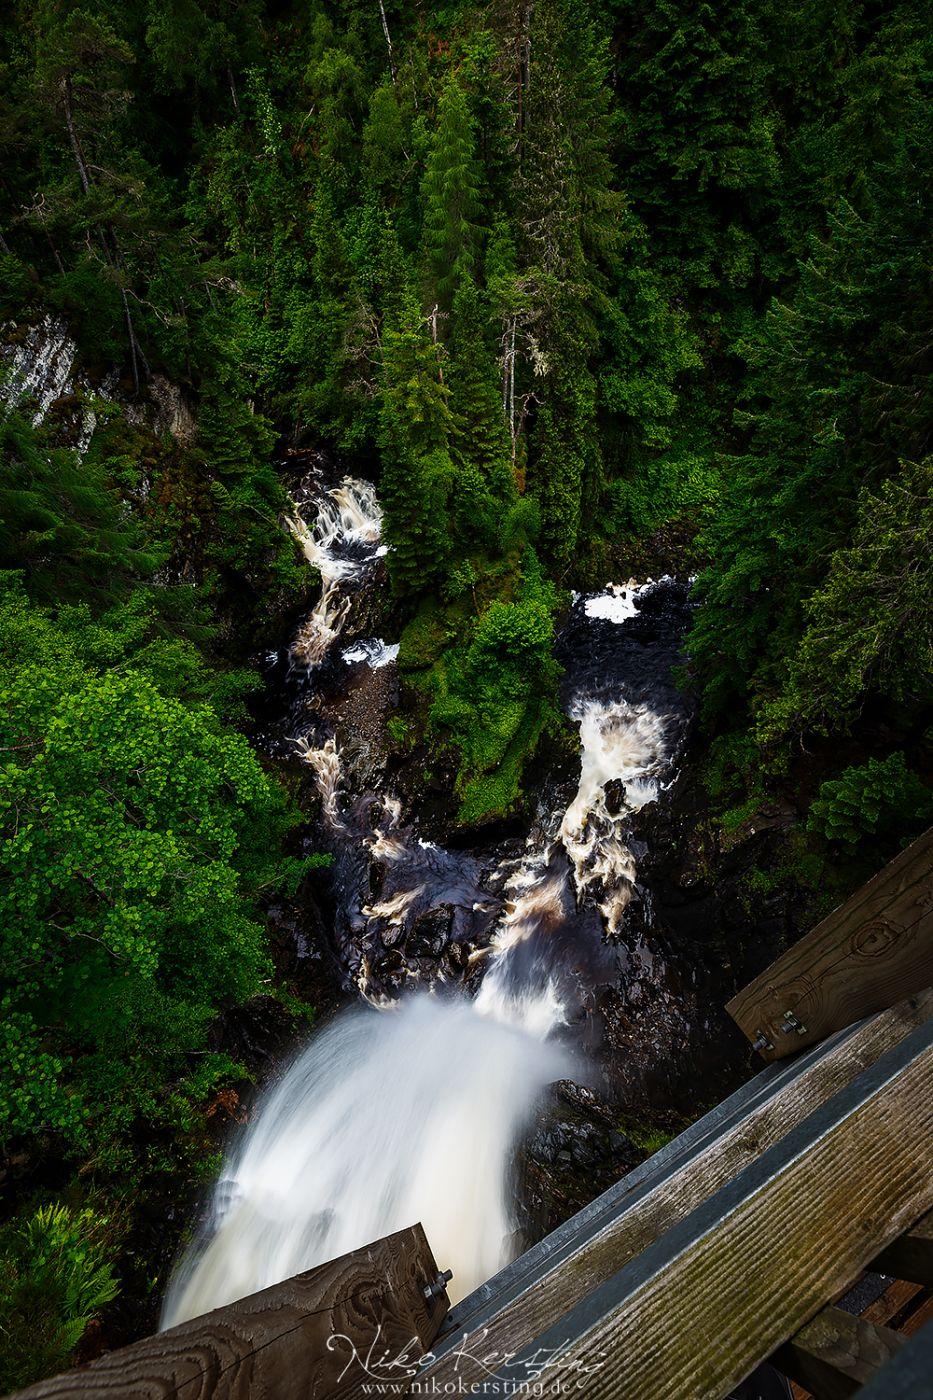 Plodda Falls, United Kingdom